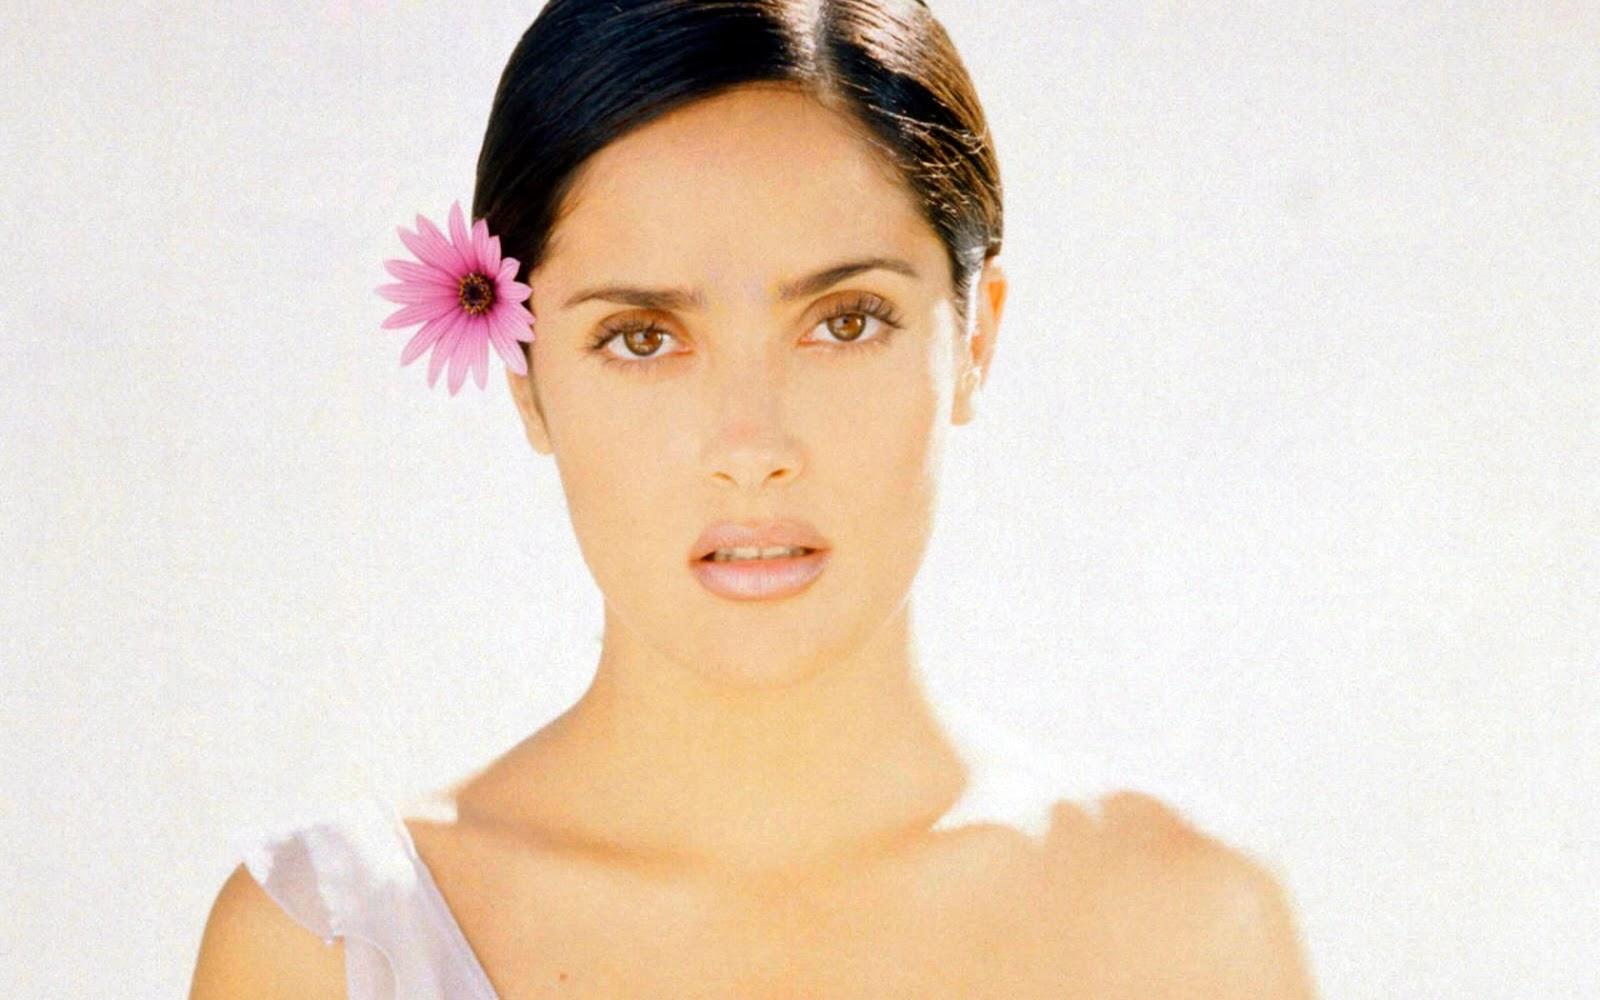 Kingfisher Model Nathalia Kaur Part 1 - PHOTO BUZZER